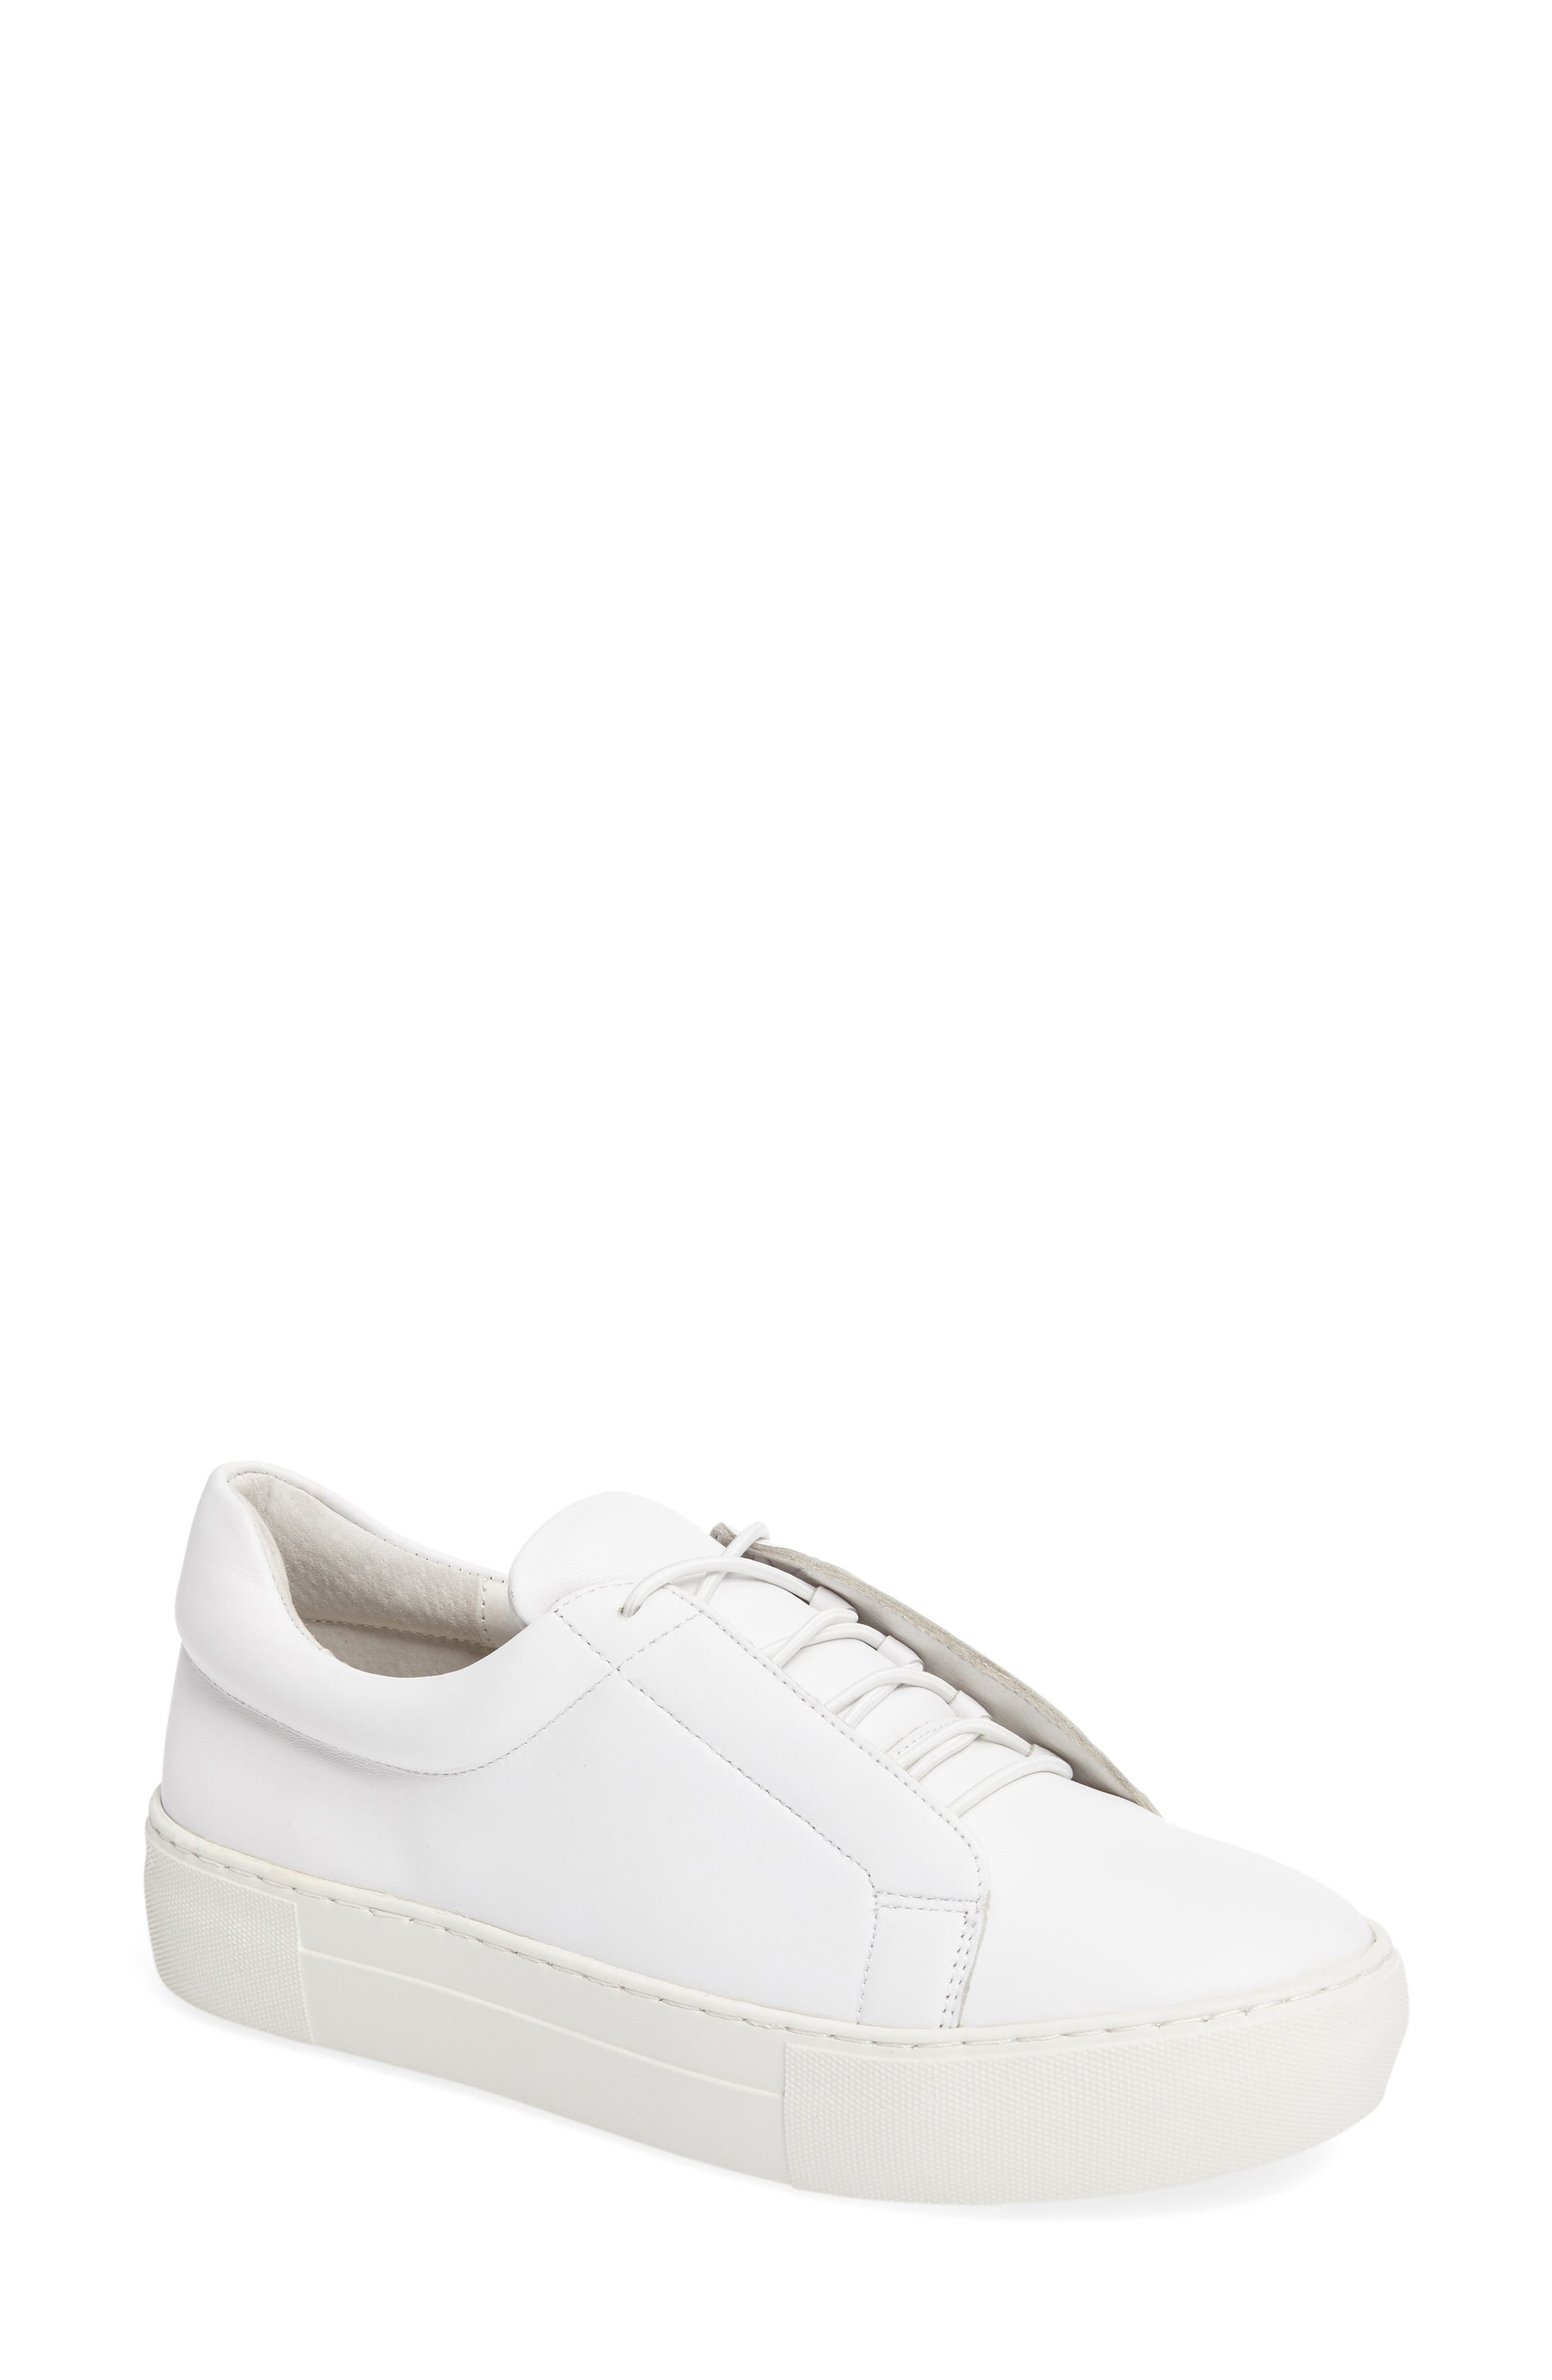 JSlides Alice Platform Sneaker (Women)